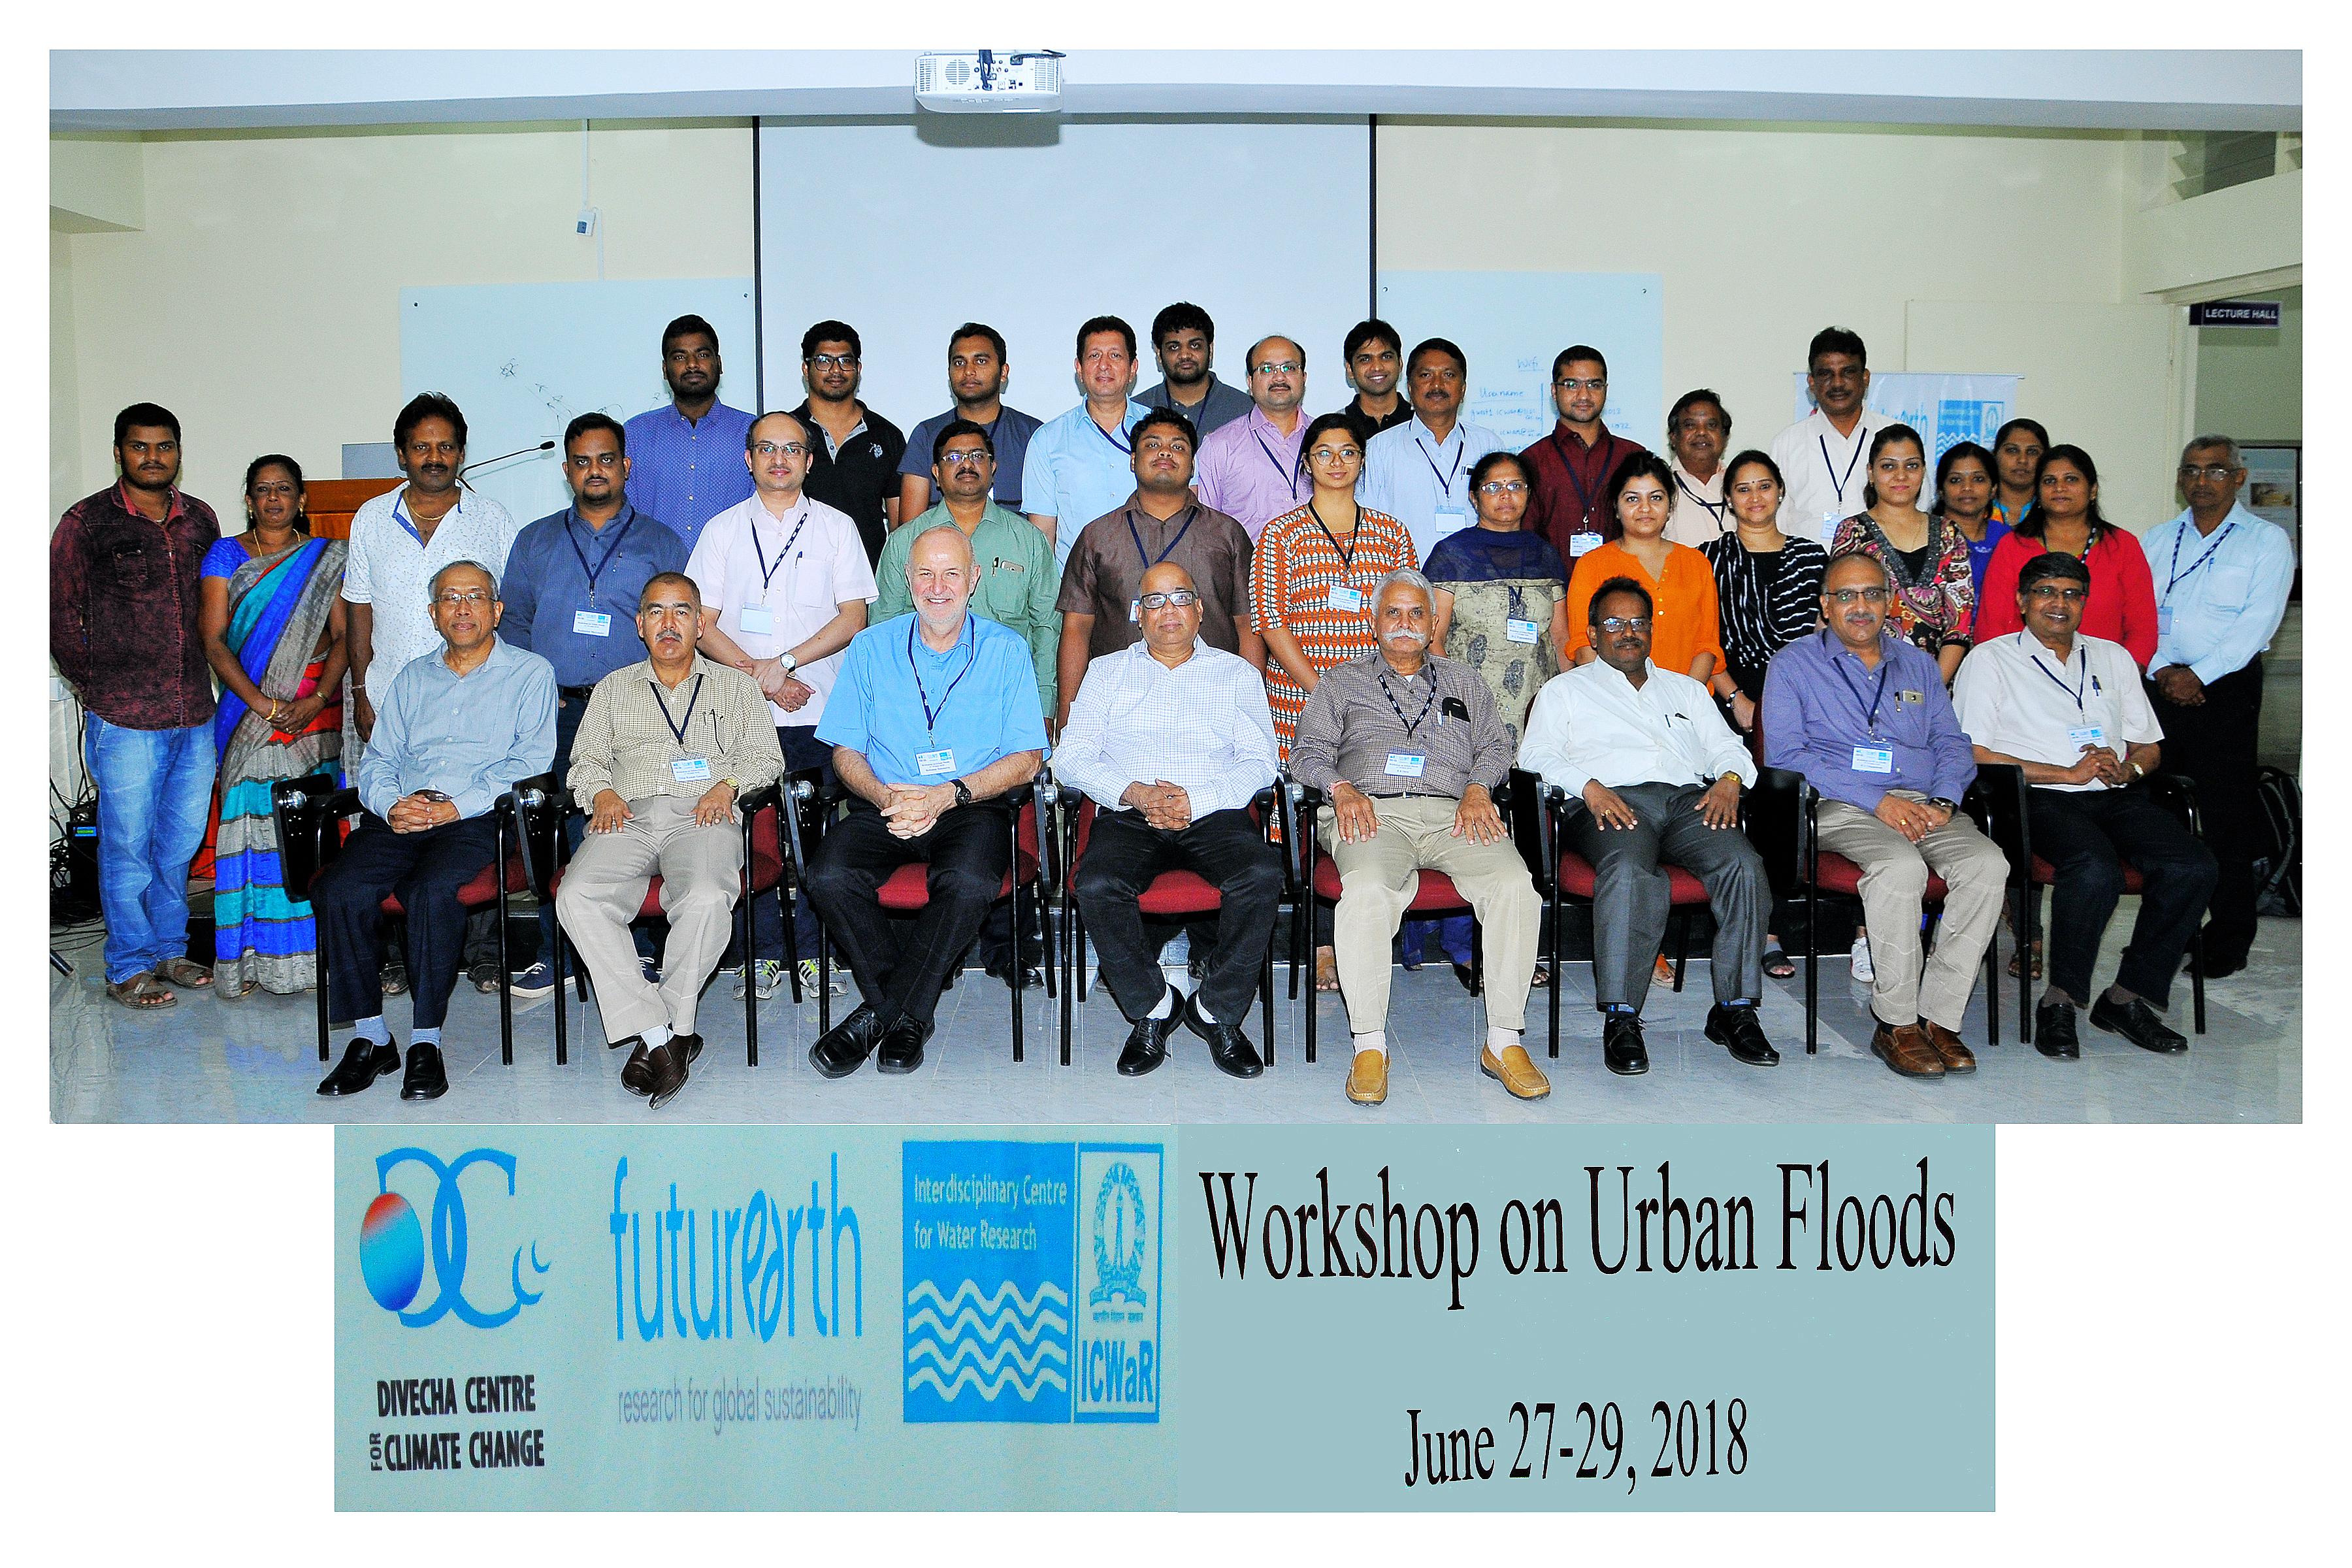 Workshop-on-Urban-Floods-28-06-2018